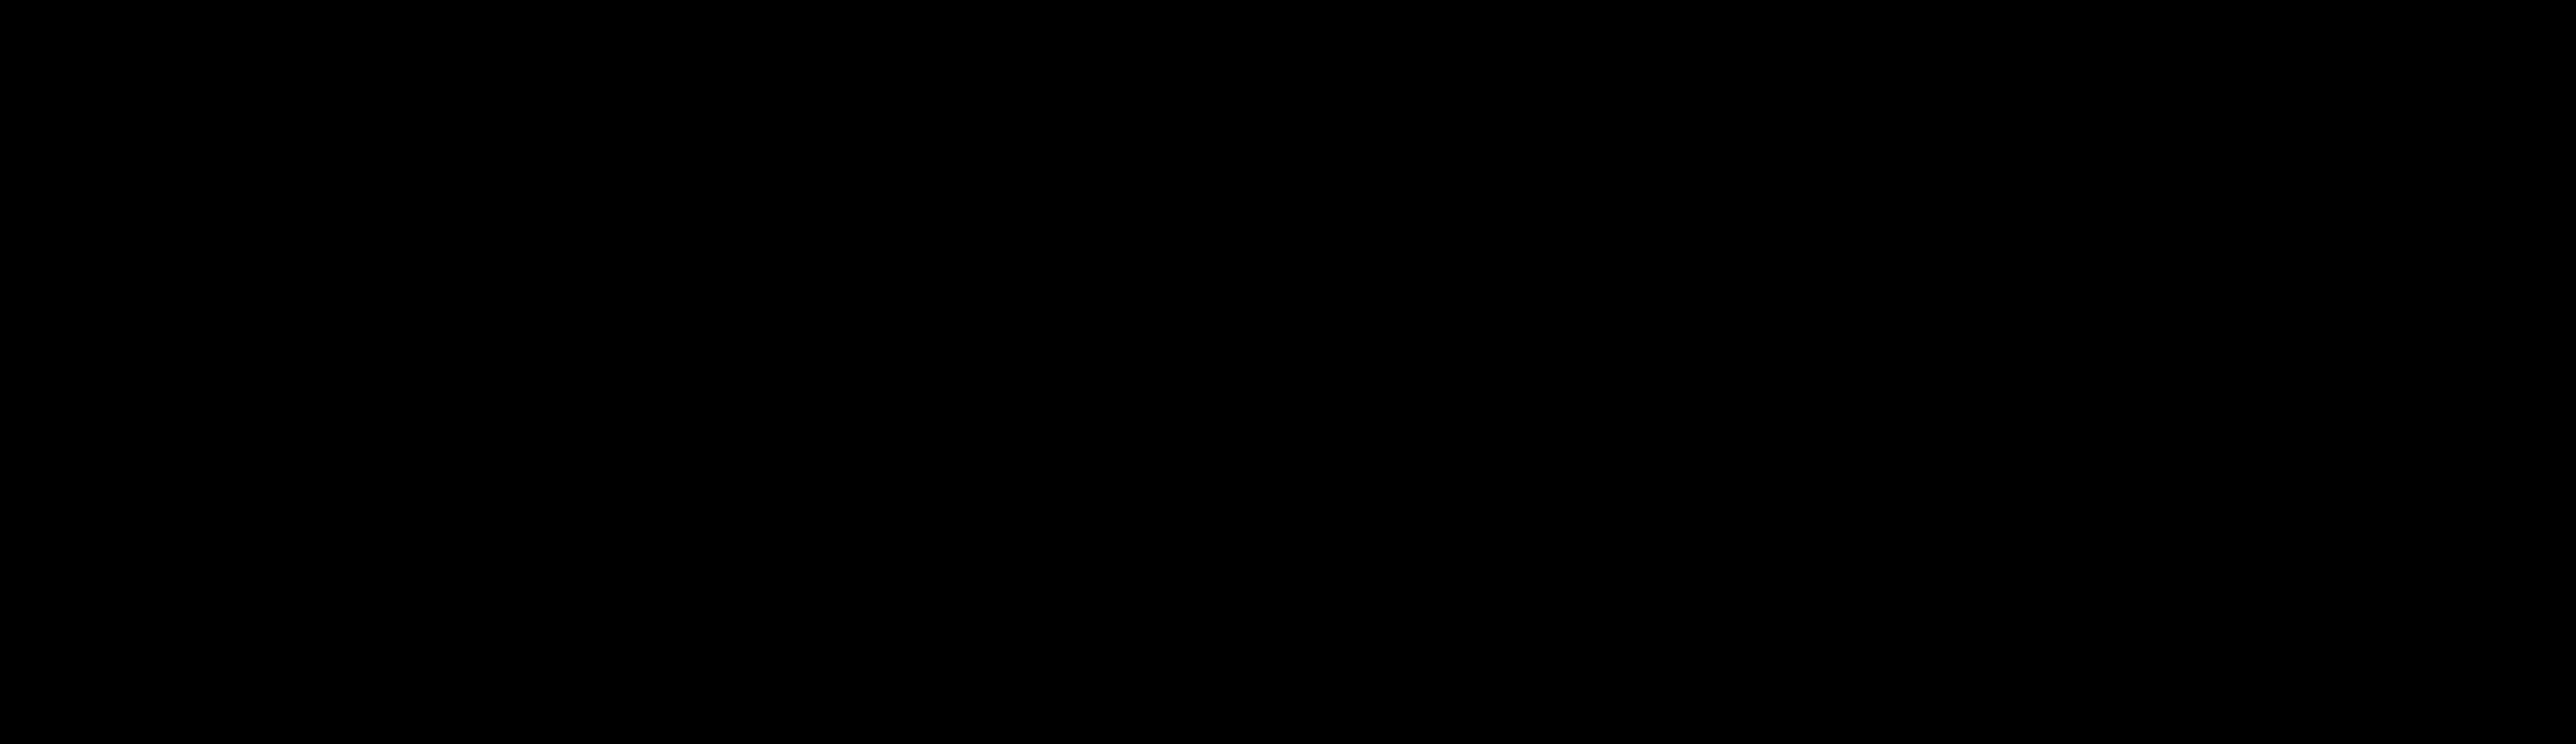 SYT OPTRONICS présent à EUROSATORY 2018